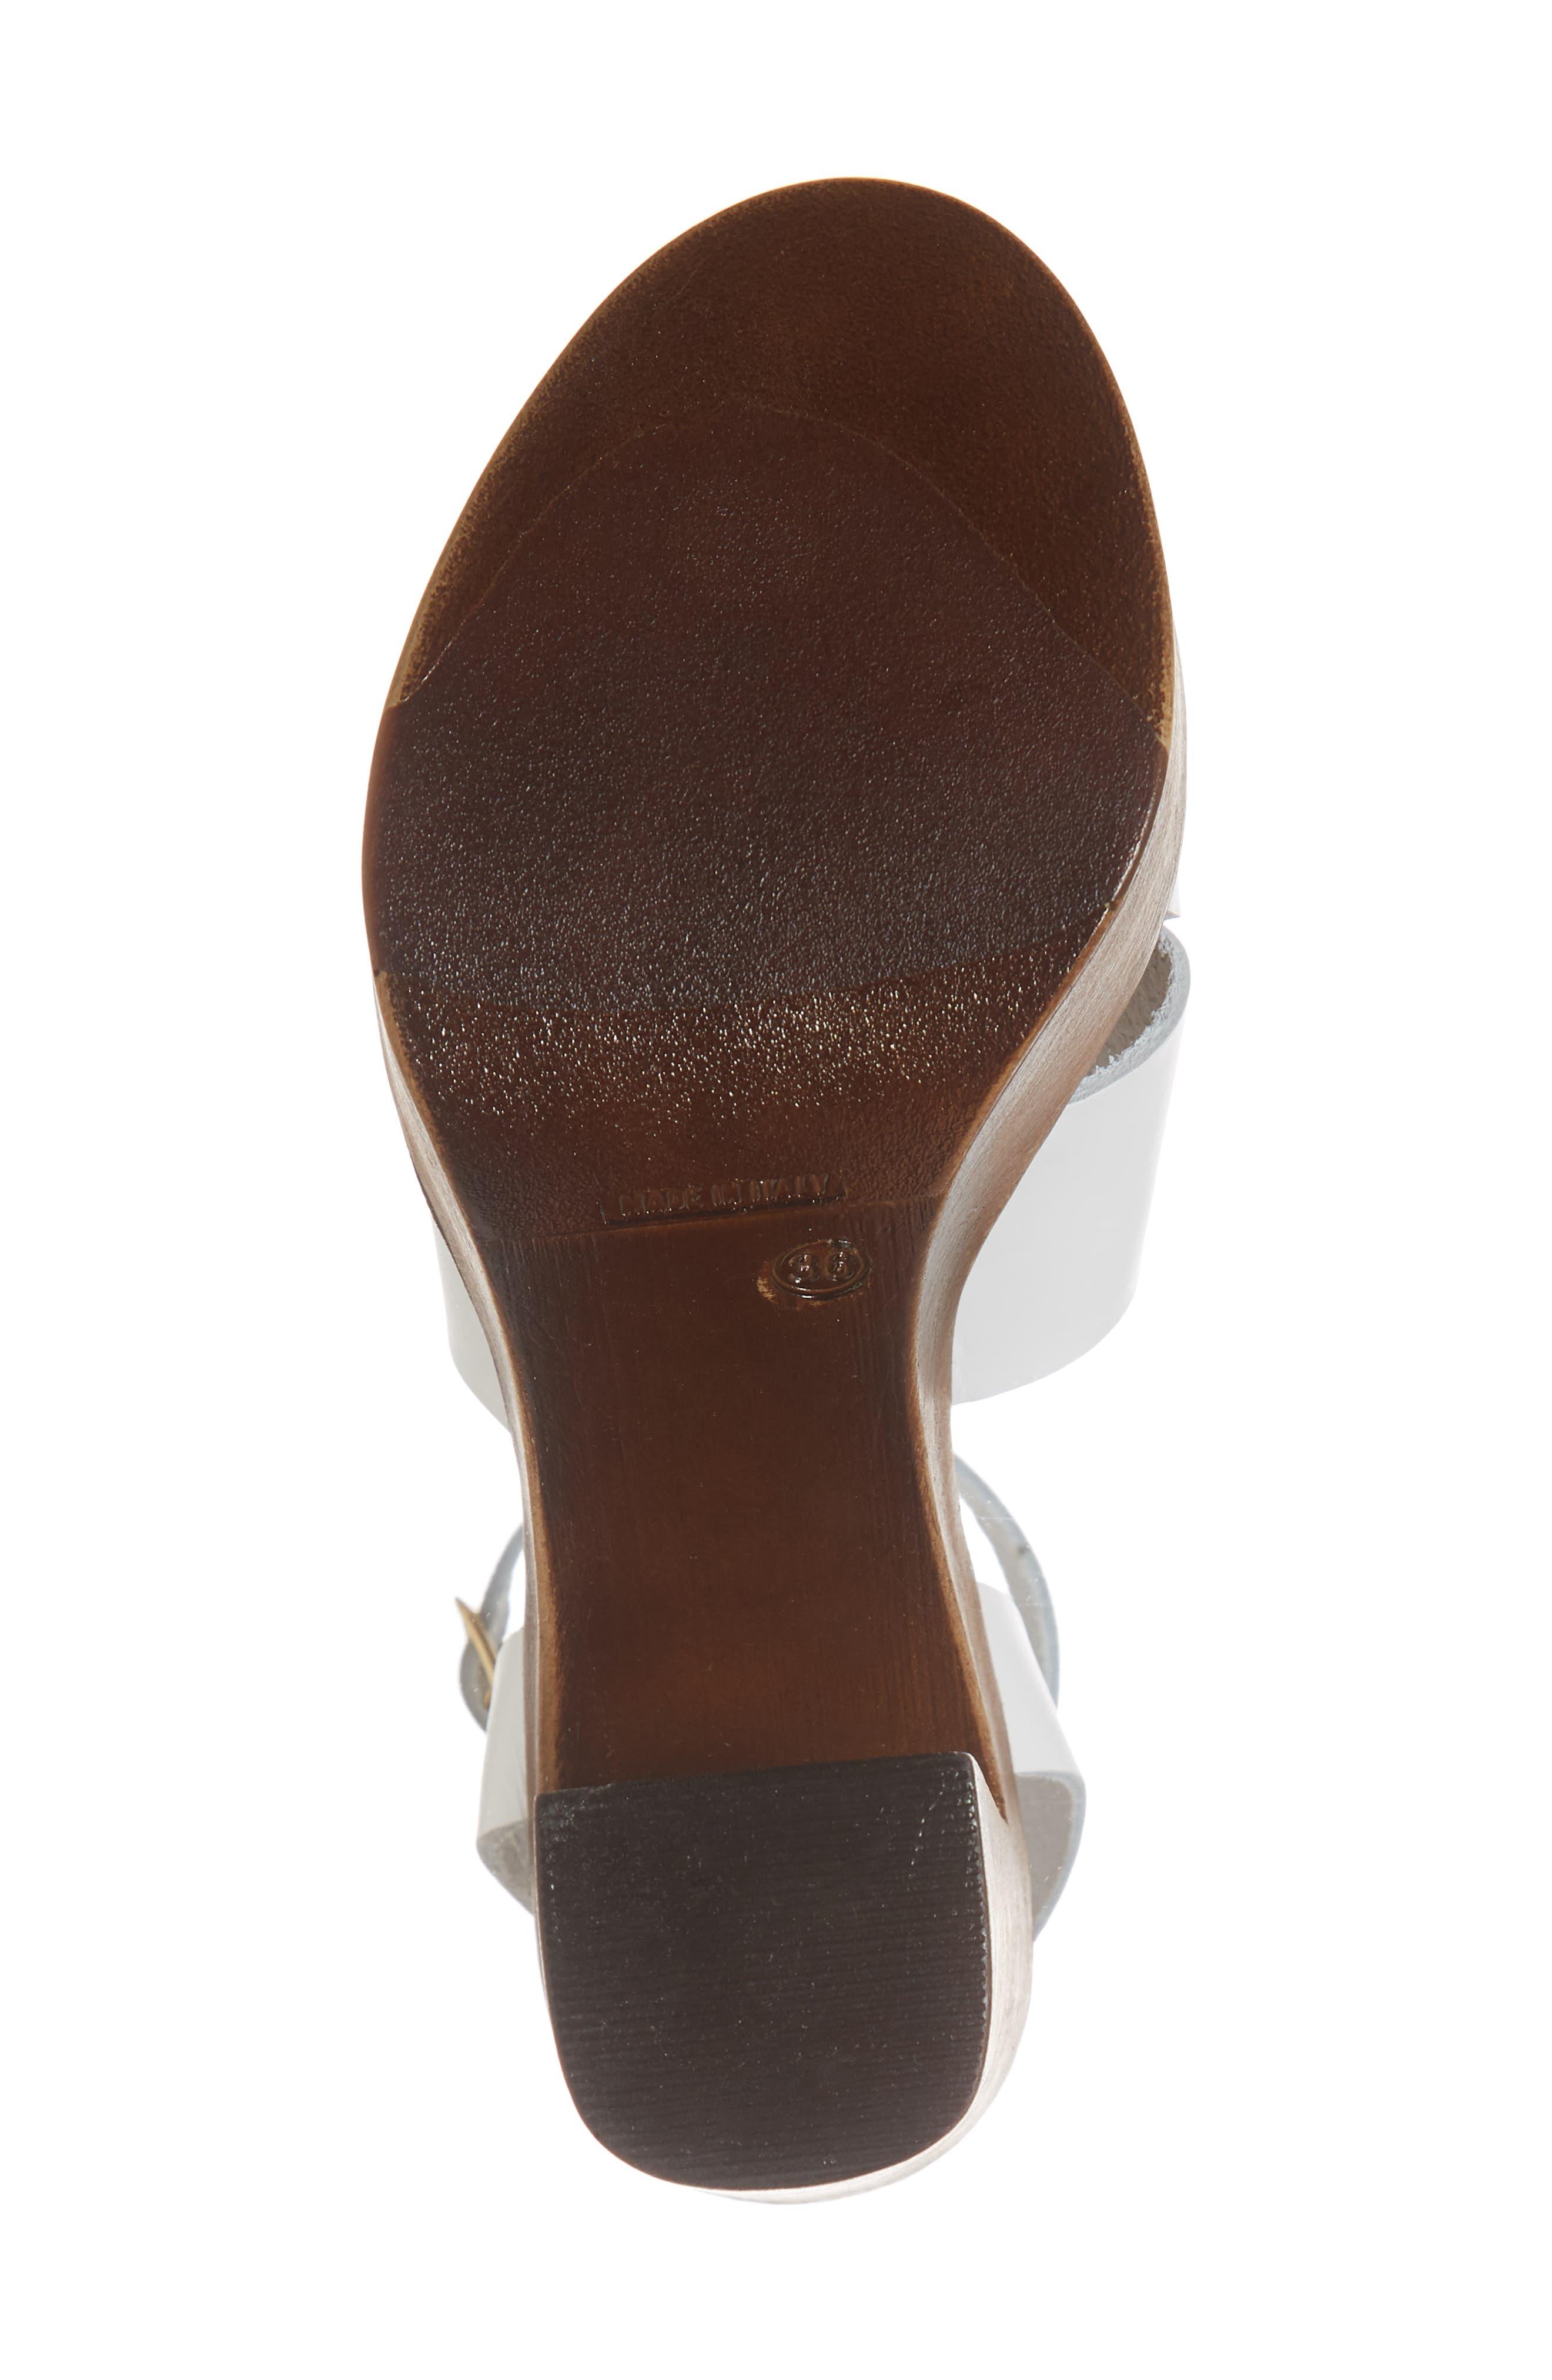 Liliana Platform Sandal,                             Alternate thumbnail 6, color,                             110